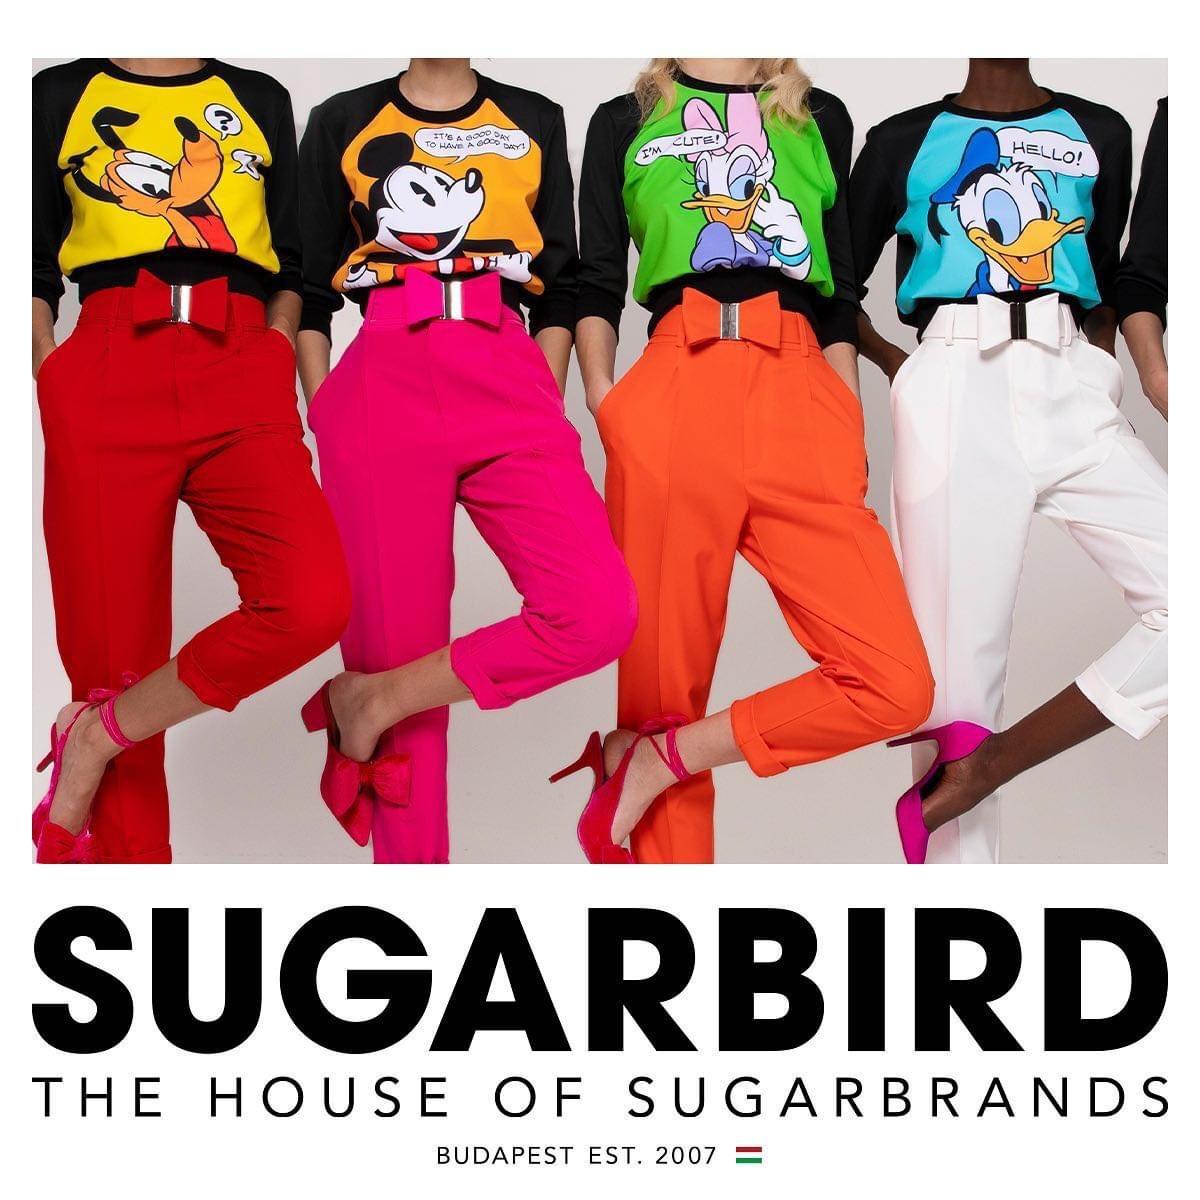 SUGARBIRD x DISNEY